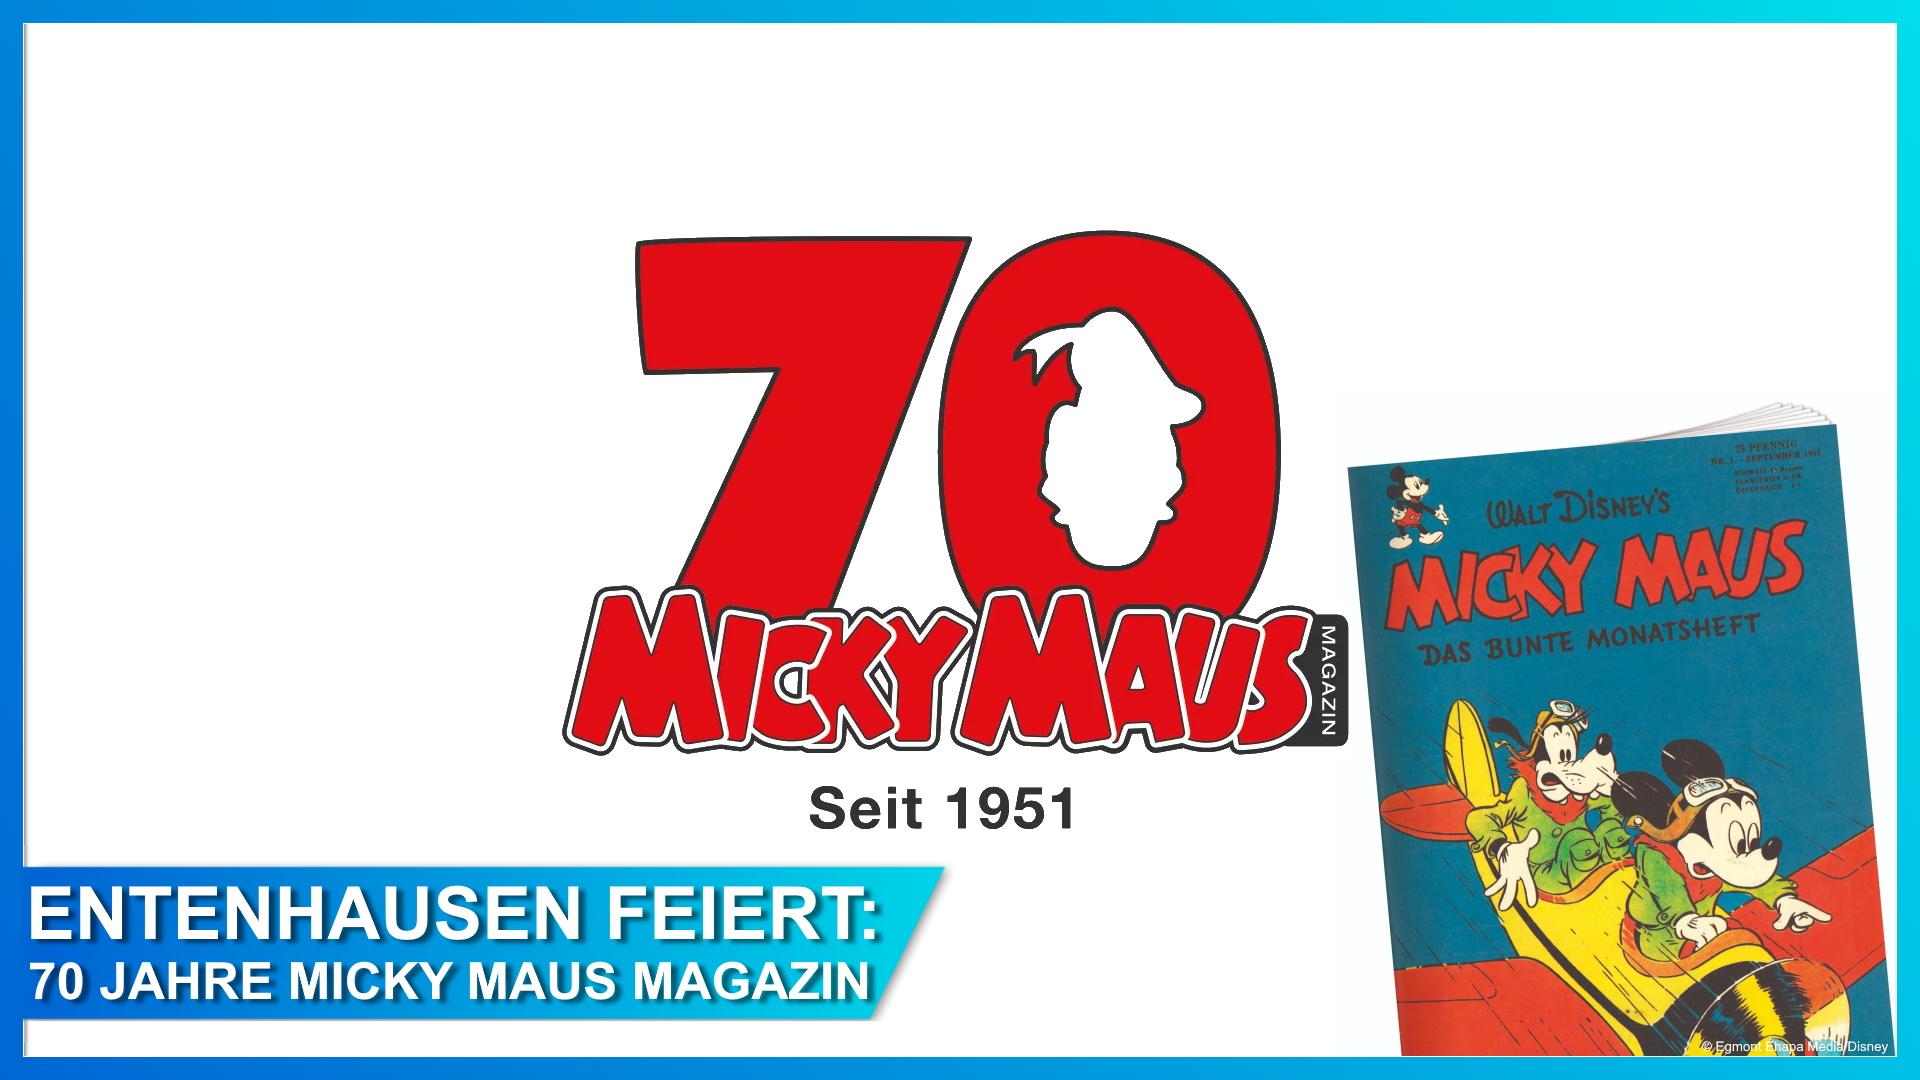 70 Jahre Micky Maus Magazin